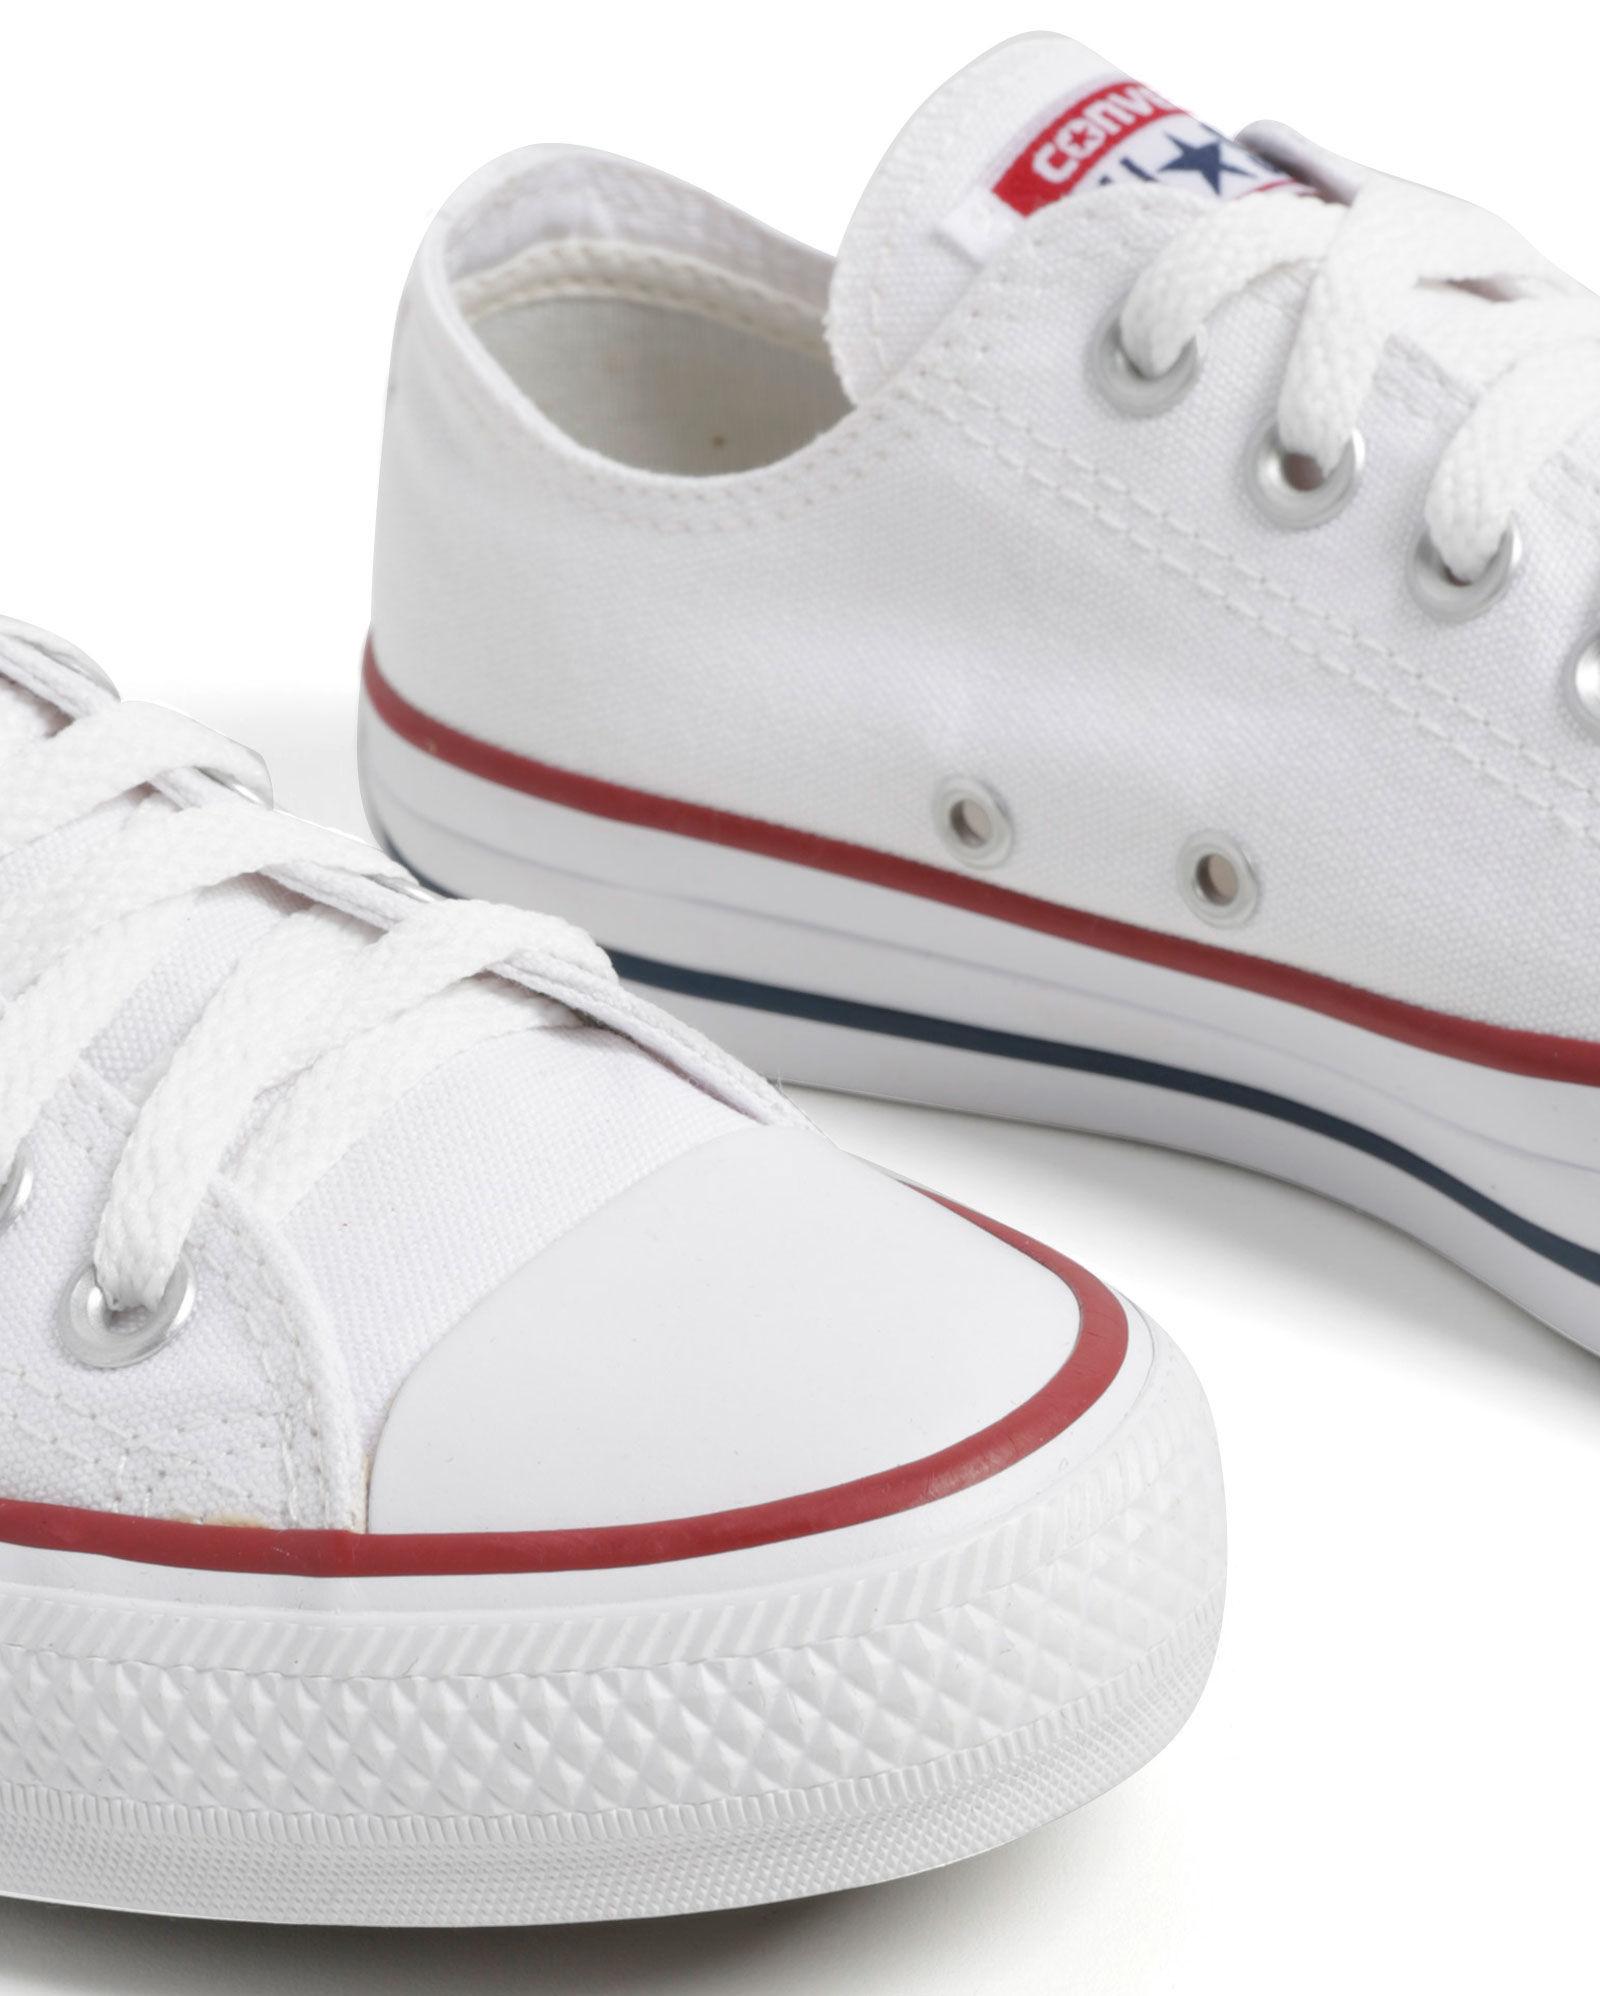 Tenis All Star Branco Feminino Ct0495